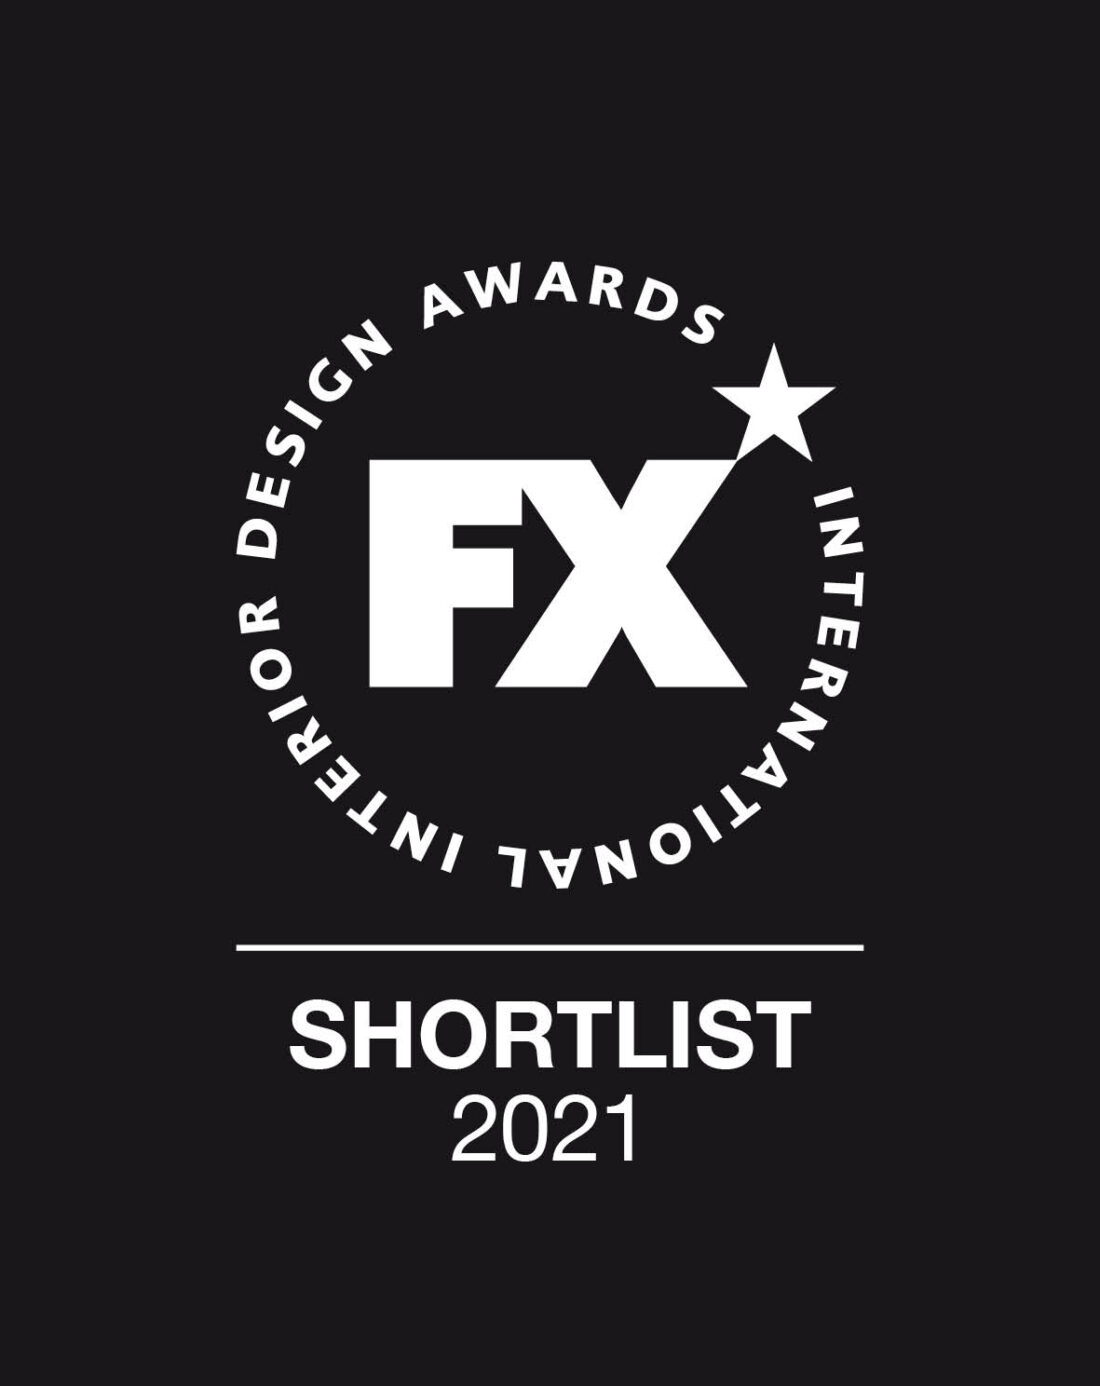 FX International Interior Design Awards Recognises Silestone Sunlit Days as a Finalist